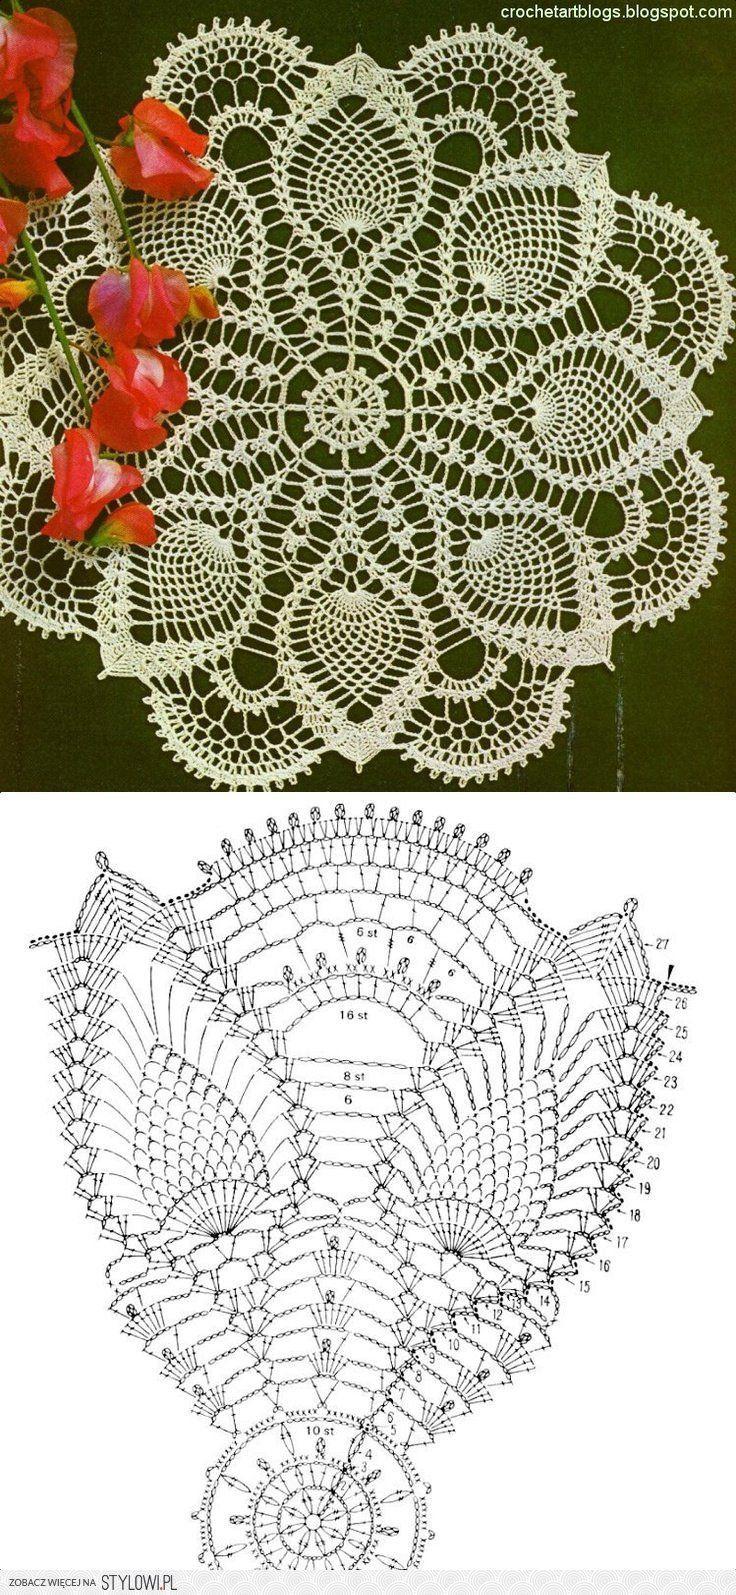 Crochet Lace Pineapple Doily and Chart | Carpeta | Pinterest ...